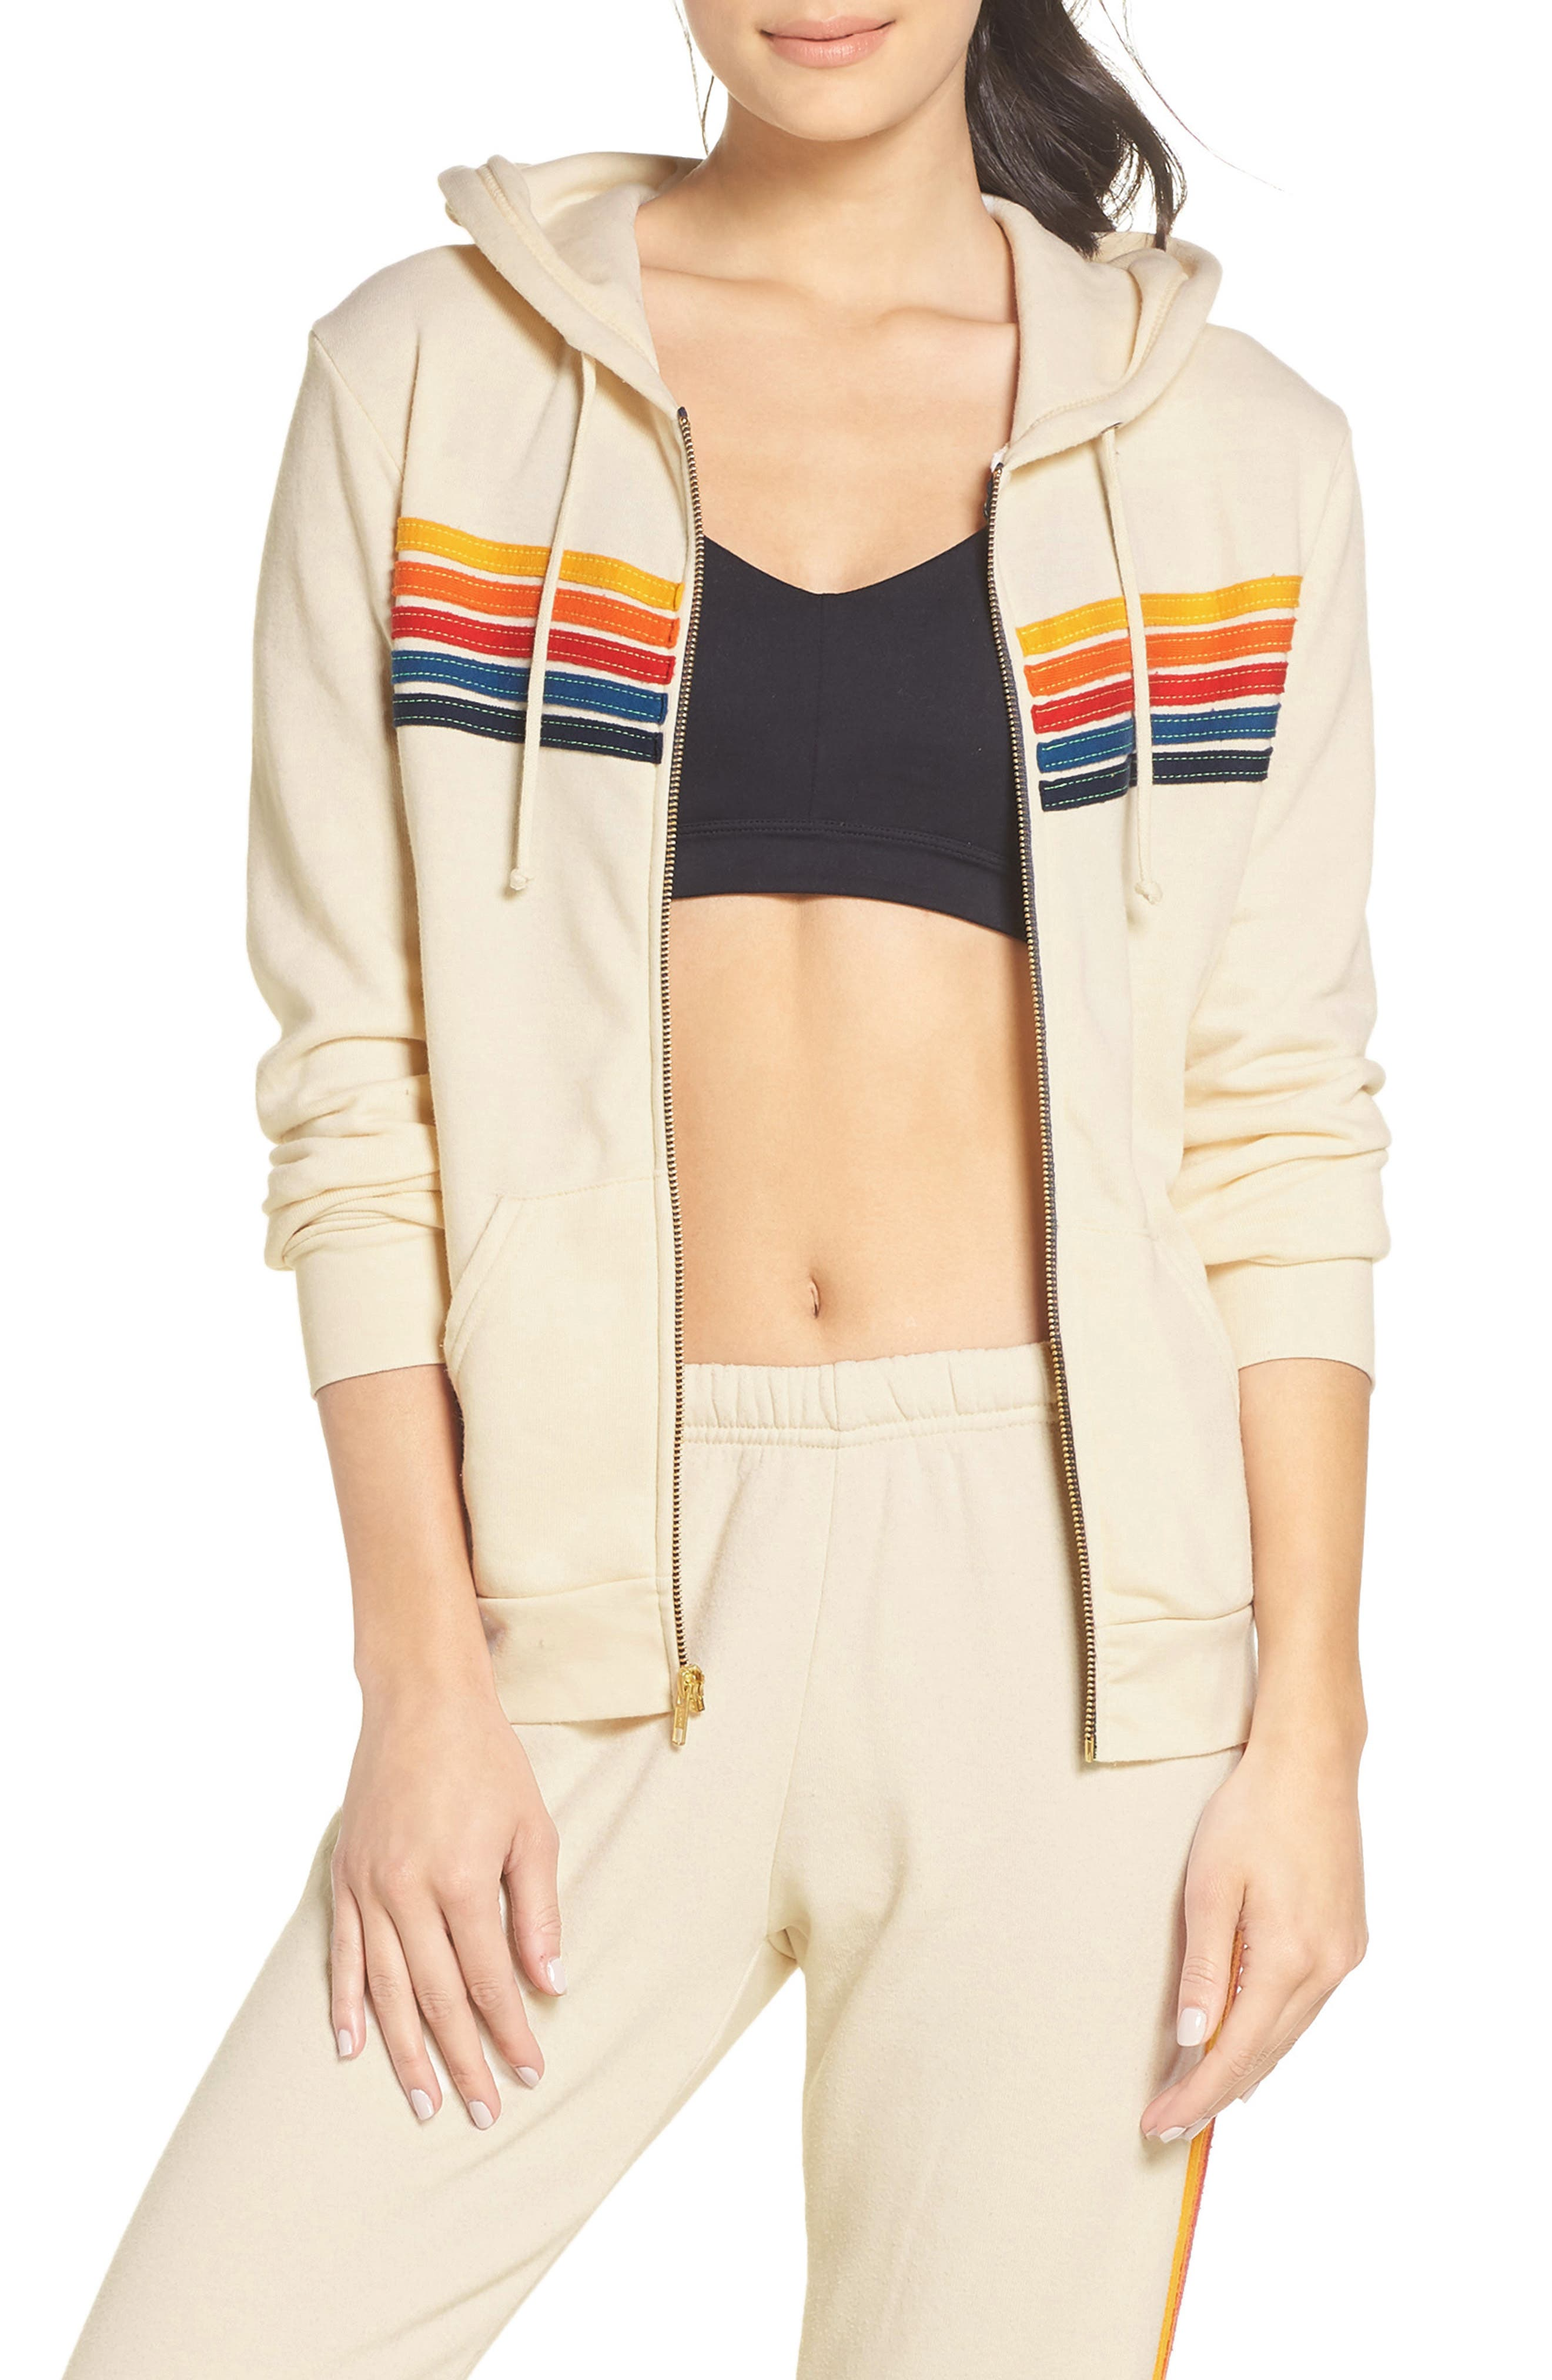 AVIATOR NATION 5-Stripe Zip Hoodie, Main, color, VINTAGE WHITE